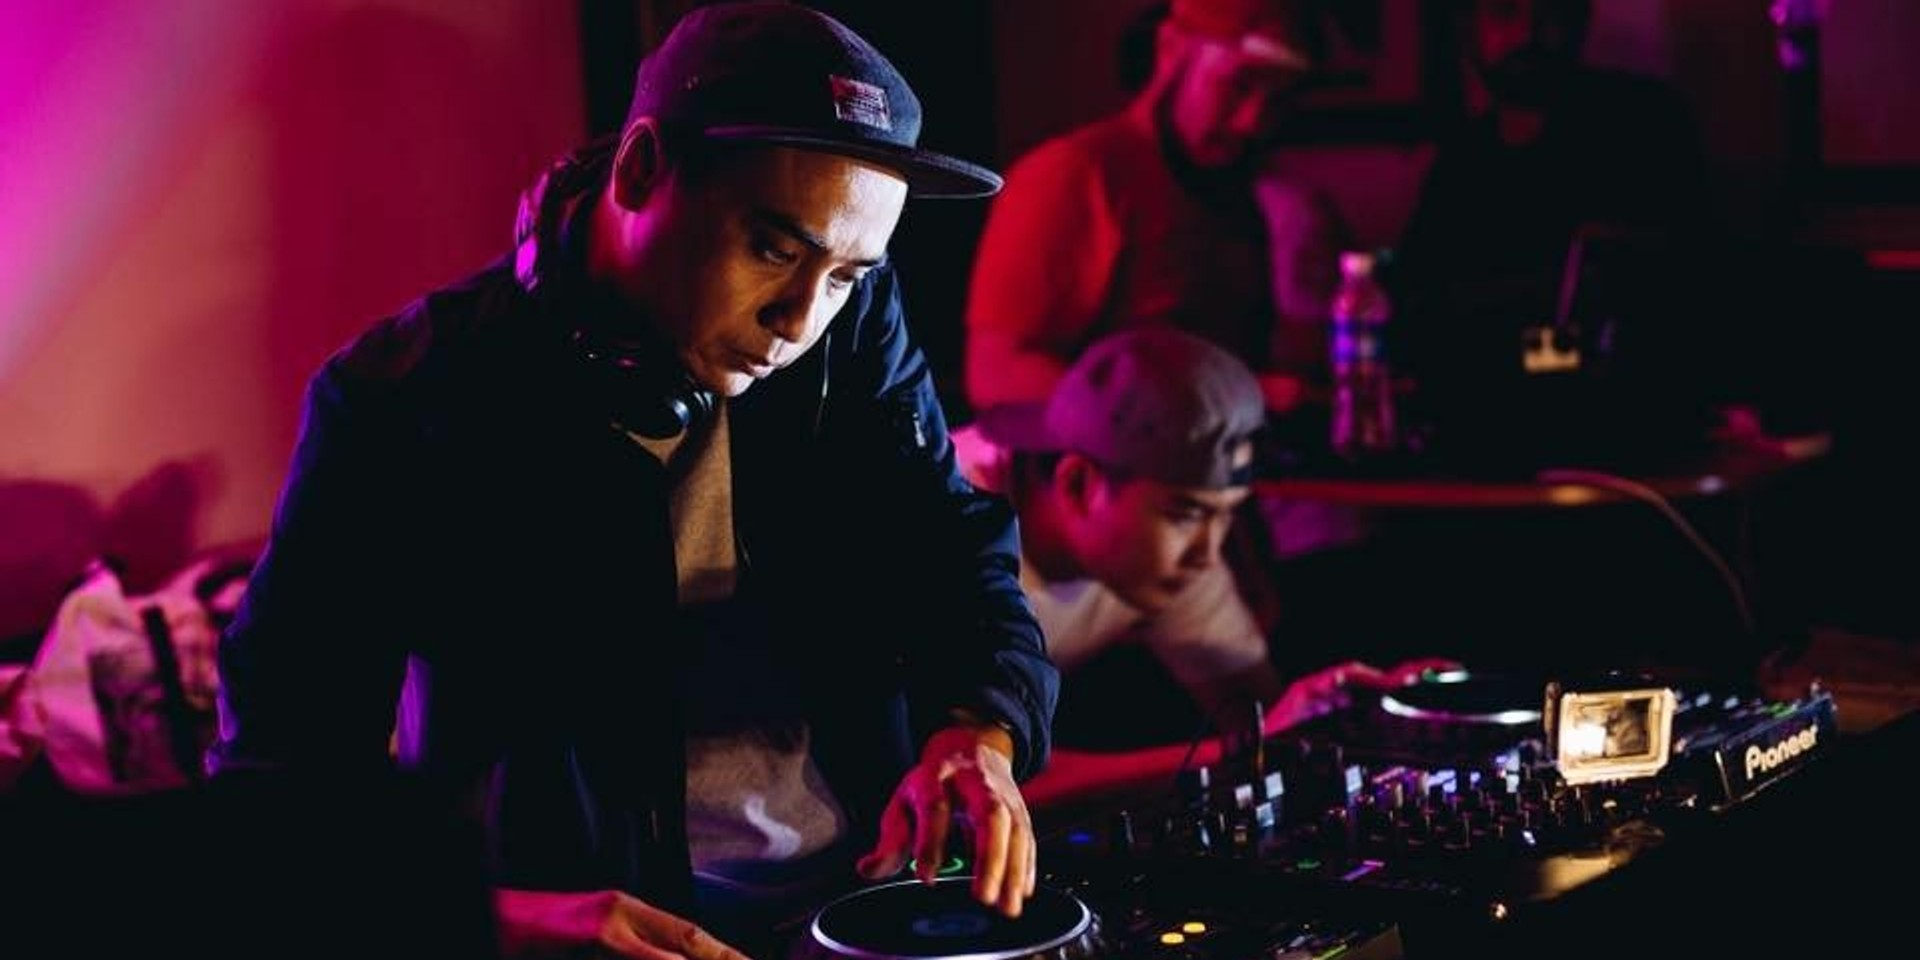 Singaporean drum & bass staple Subvert Sessions returns to Blu Jaz Cafe